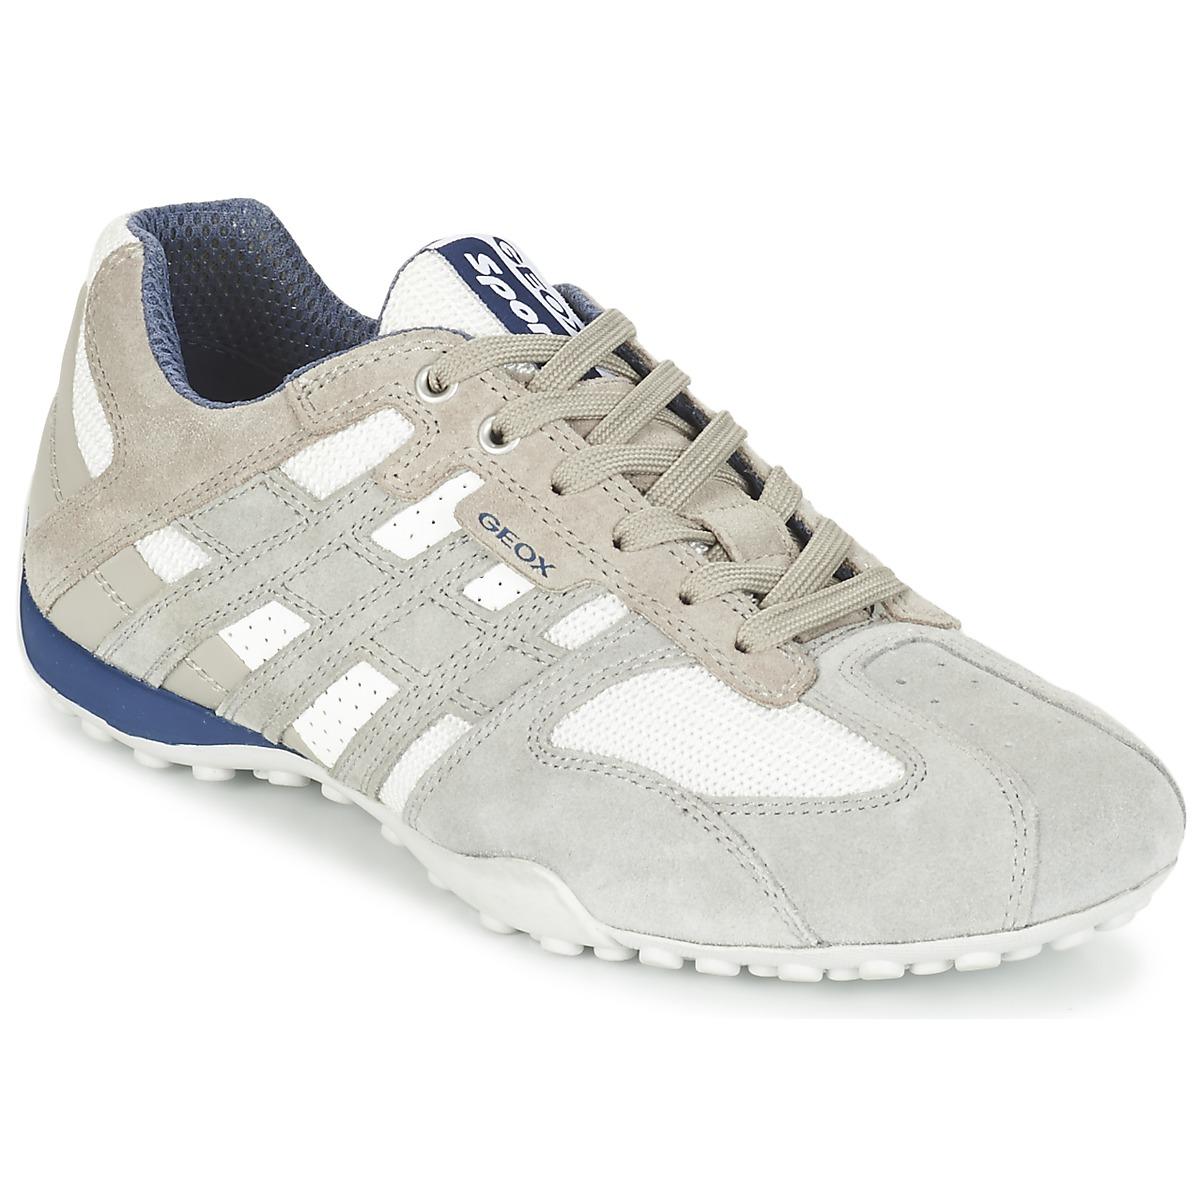 Geox SNAKE Grau / Weiss - Kostenloser Versand bei Spartoode ! - Schuhe Sneaker Low Herren 69,99 €